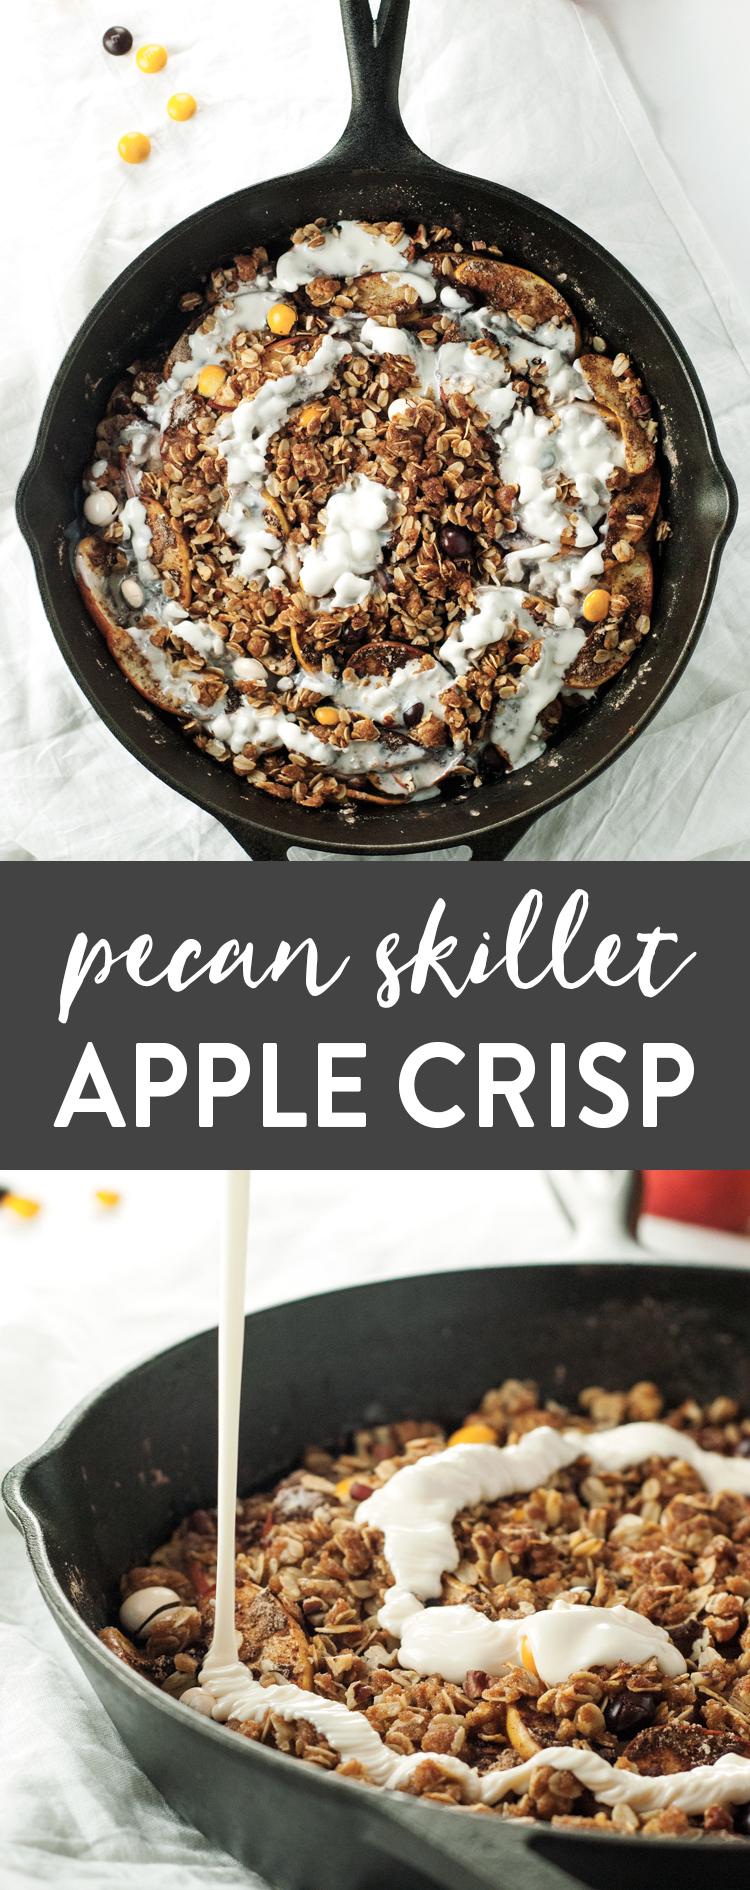 Pecan-Skillet-Apple-Crisp-16